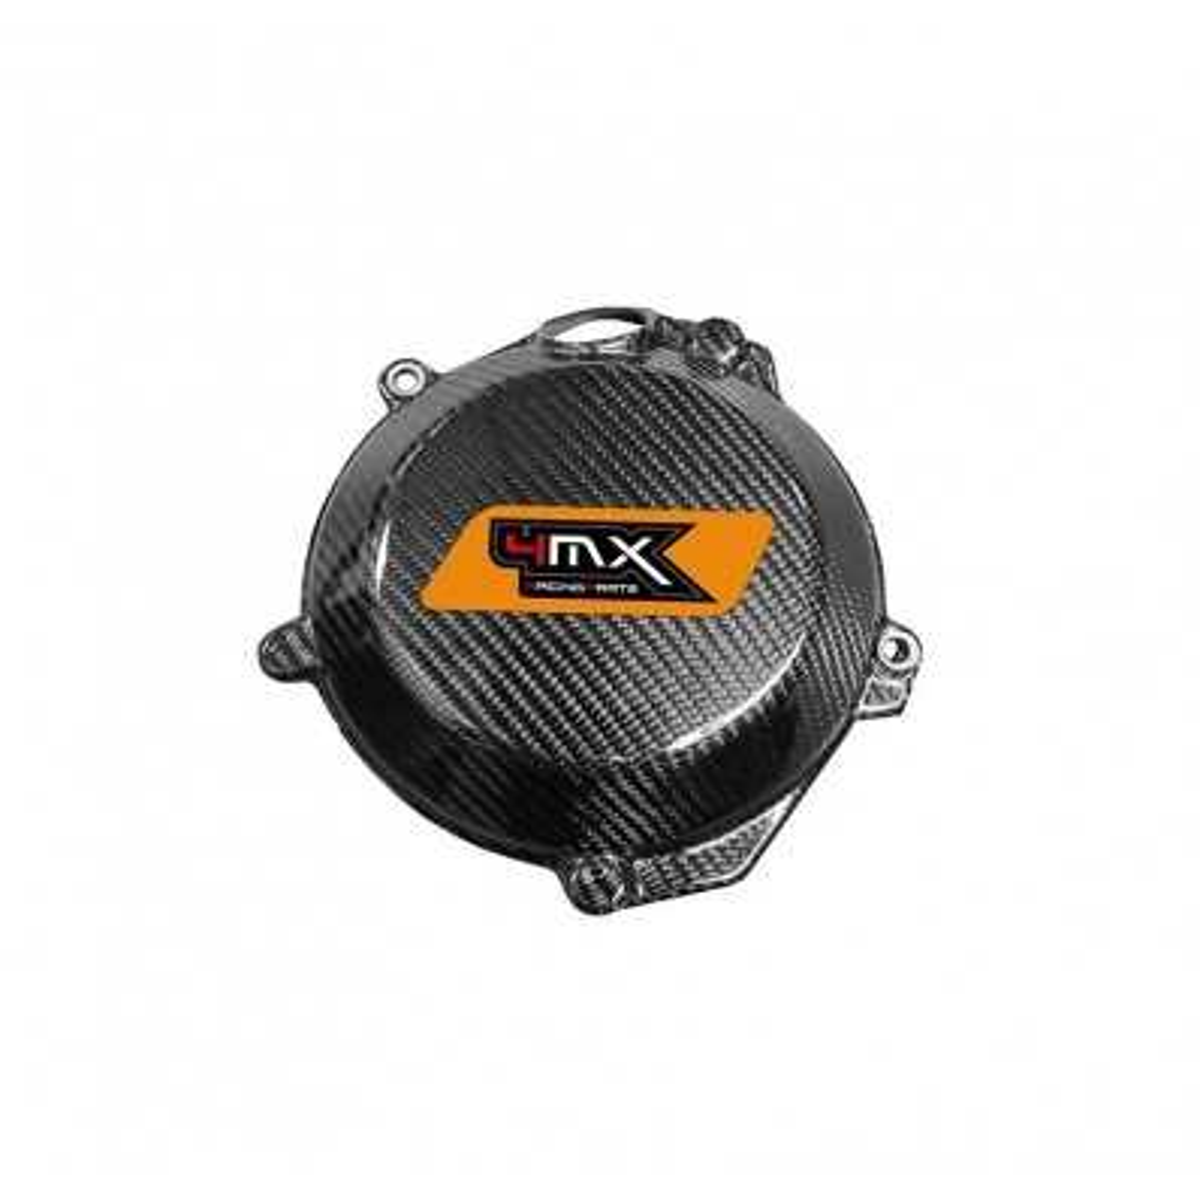 4MX16.02 - Protector Tapa Embrague Carbono Ktm Exc-F 250 350 Sxf 250 350 16 17 Husky Fe 250 350 17 Fc 250 17